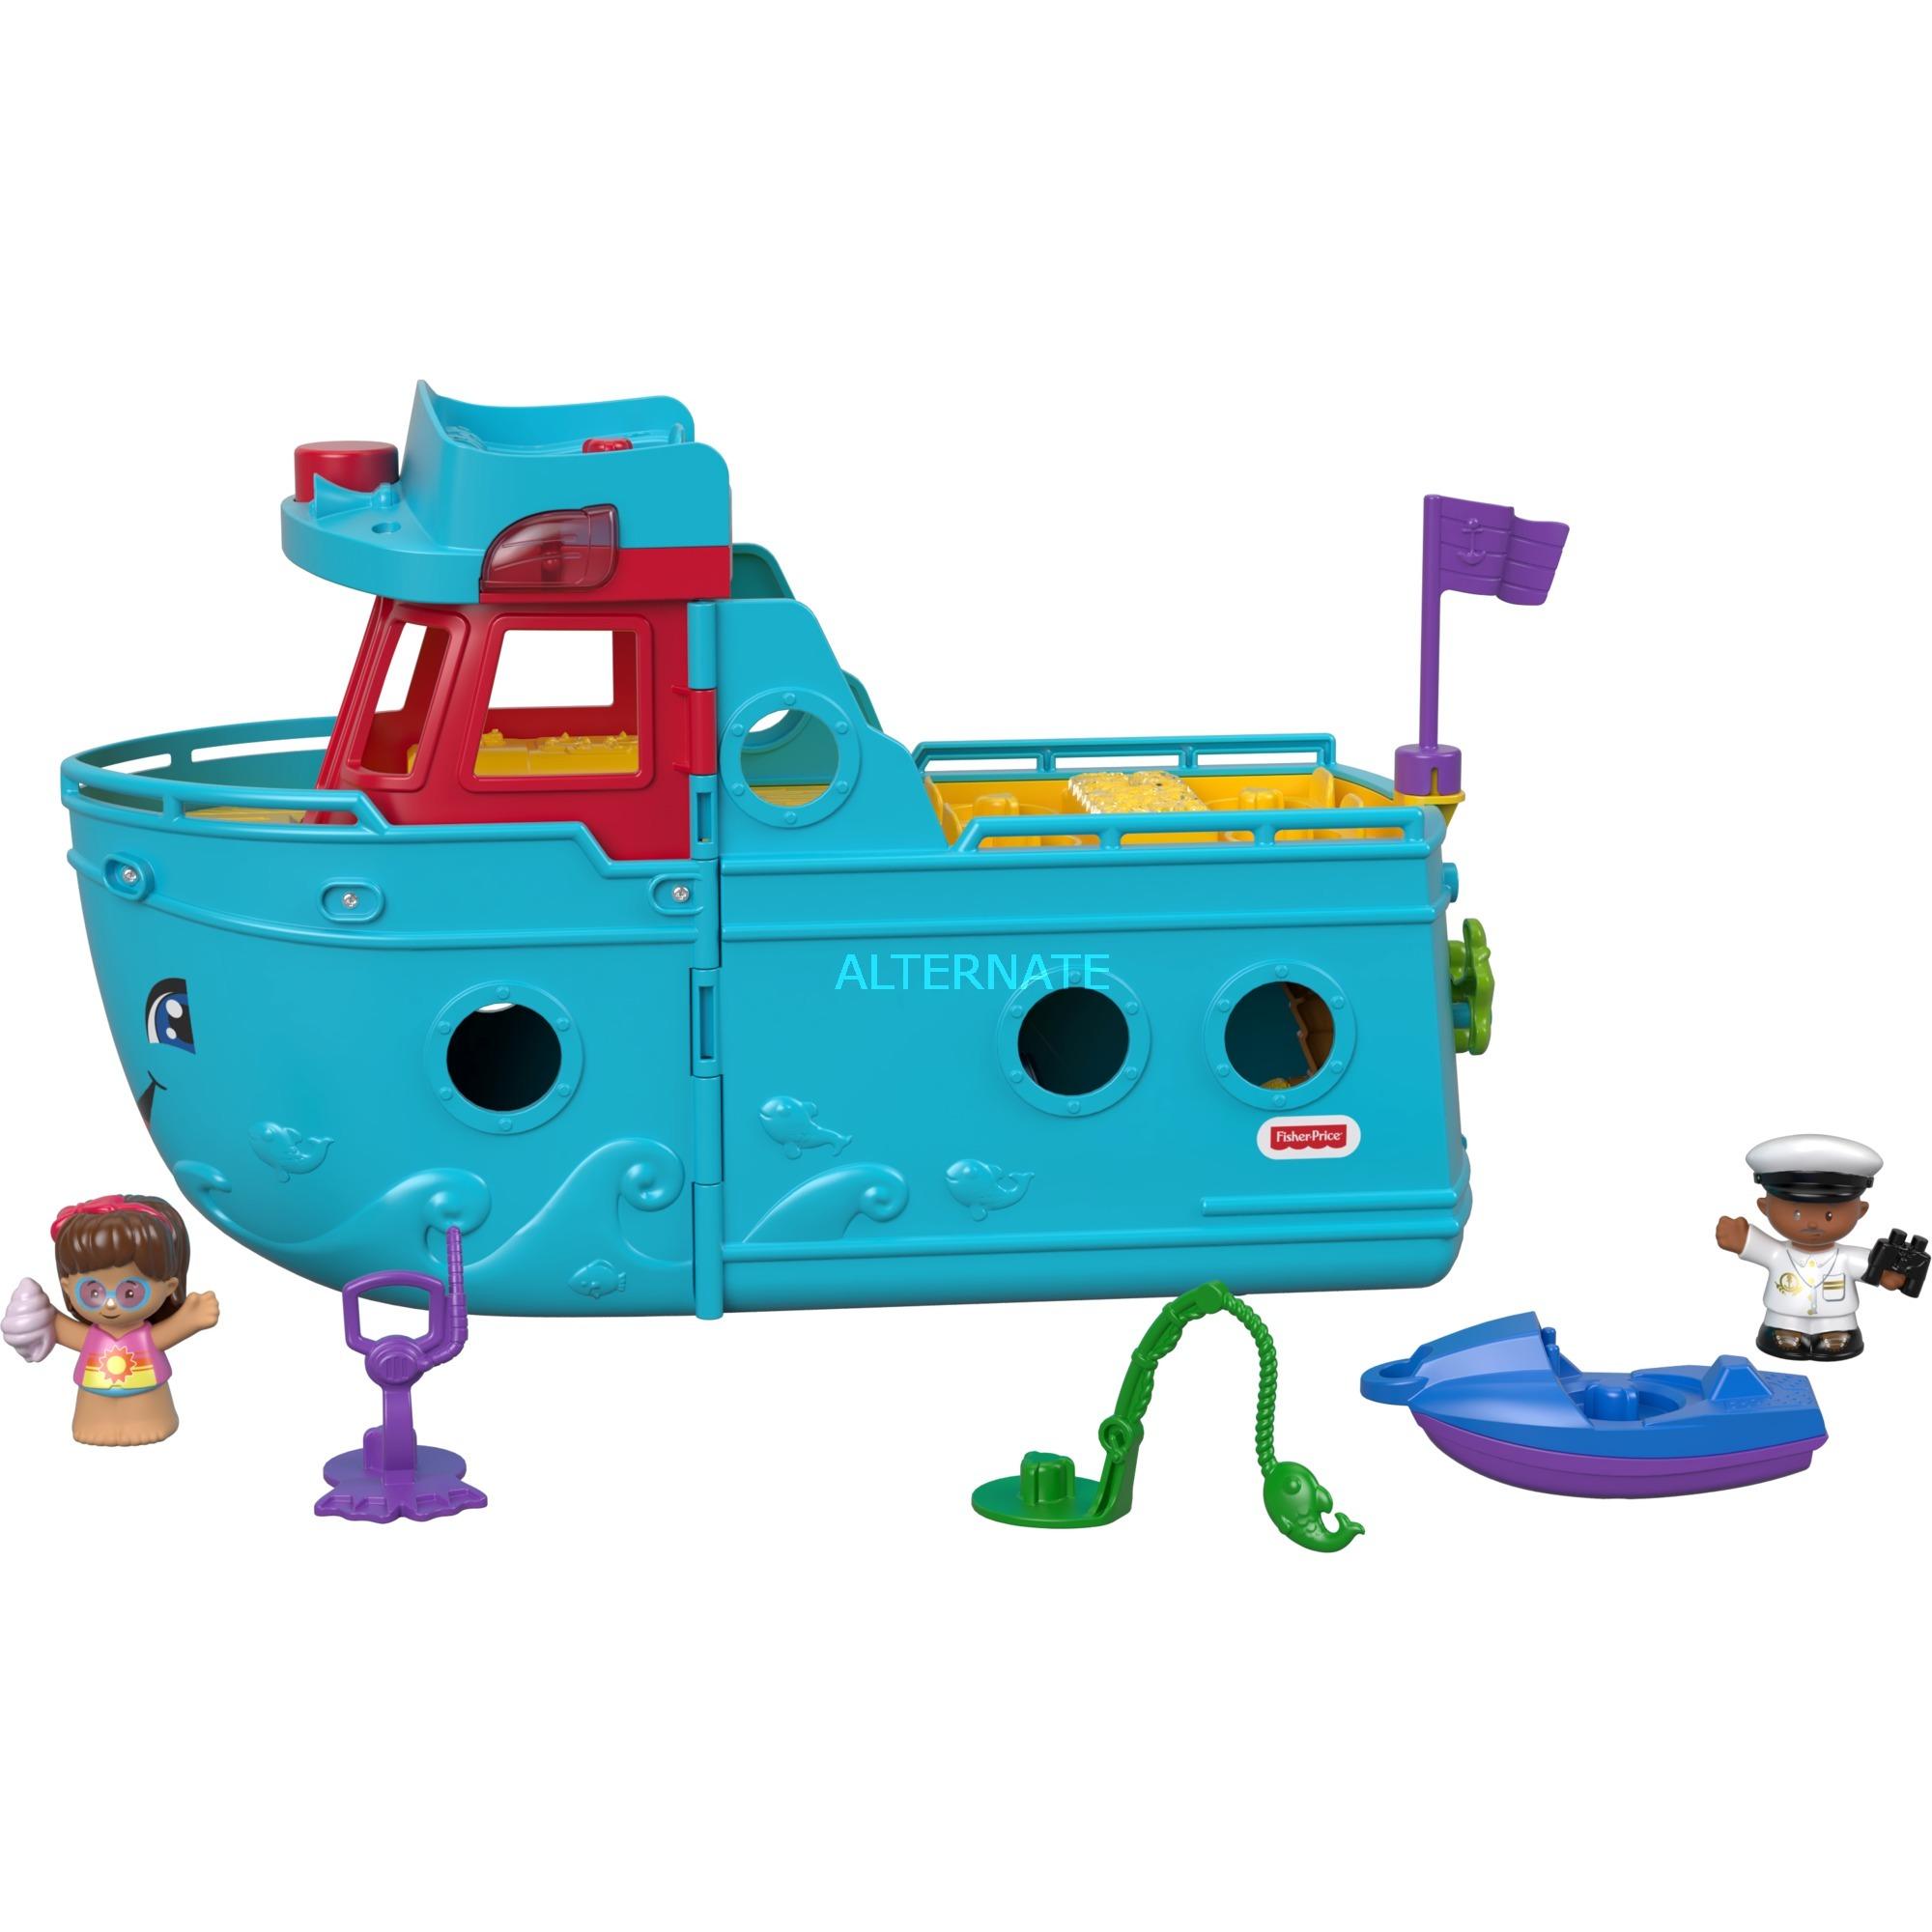 Little People FXJ47 vehículo de juguete